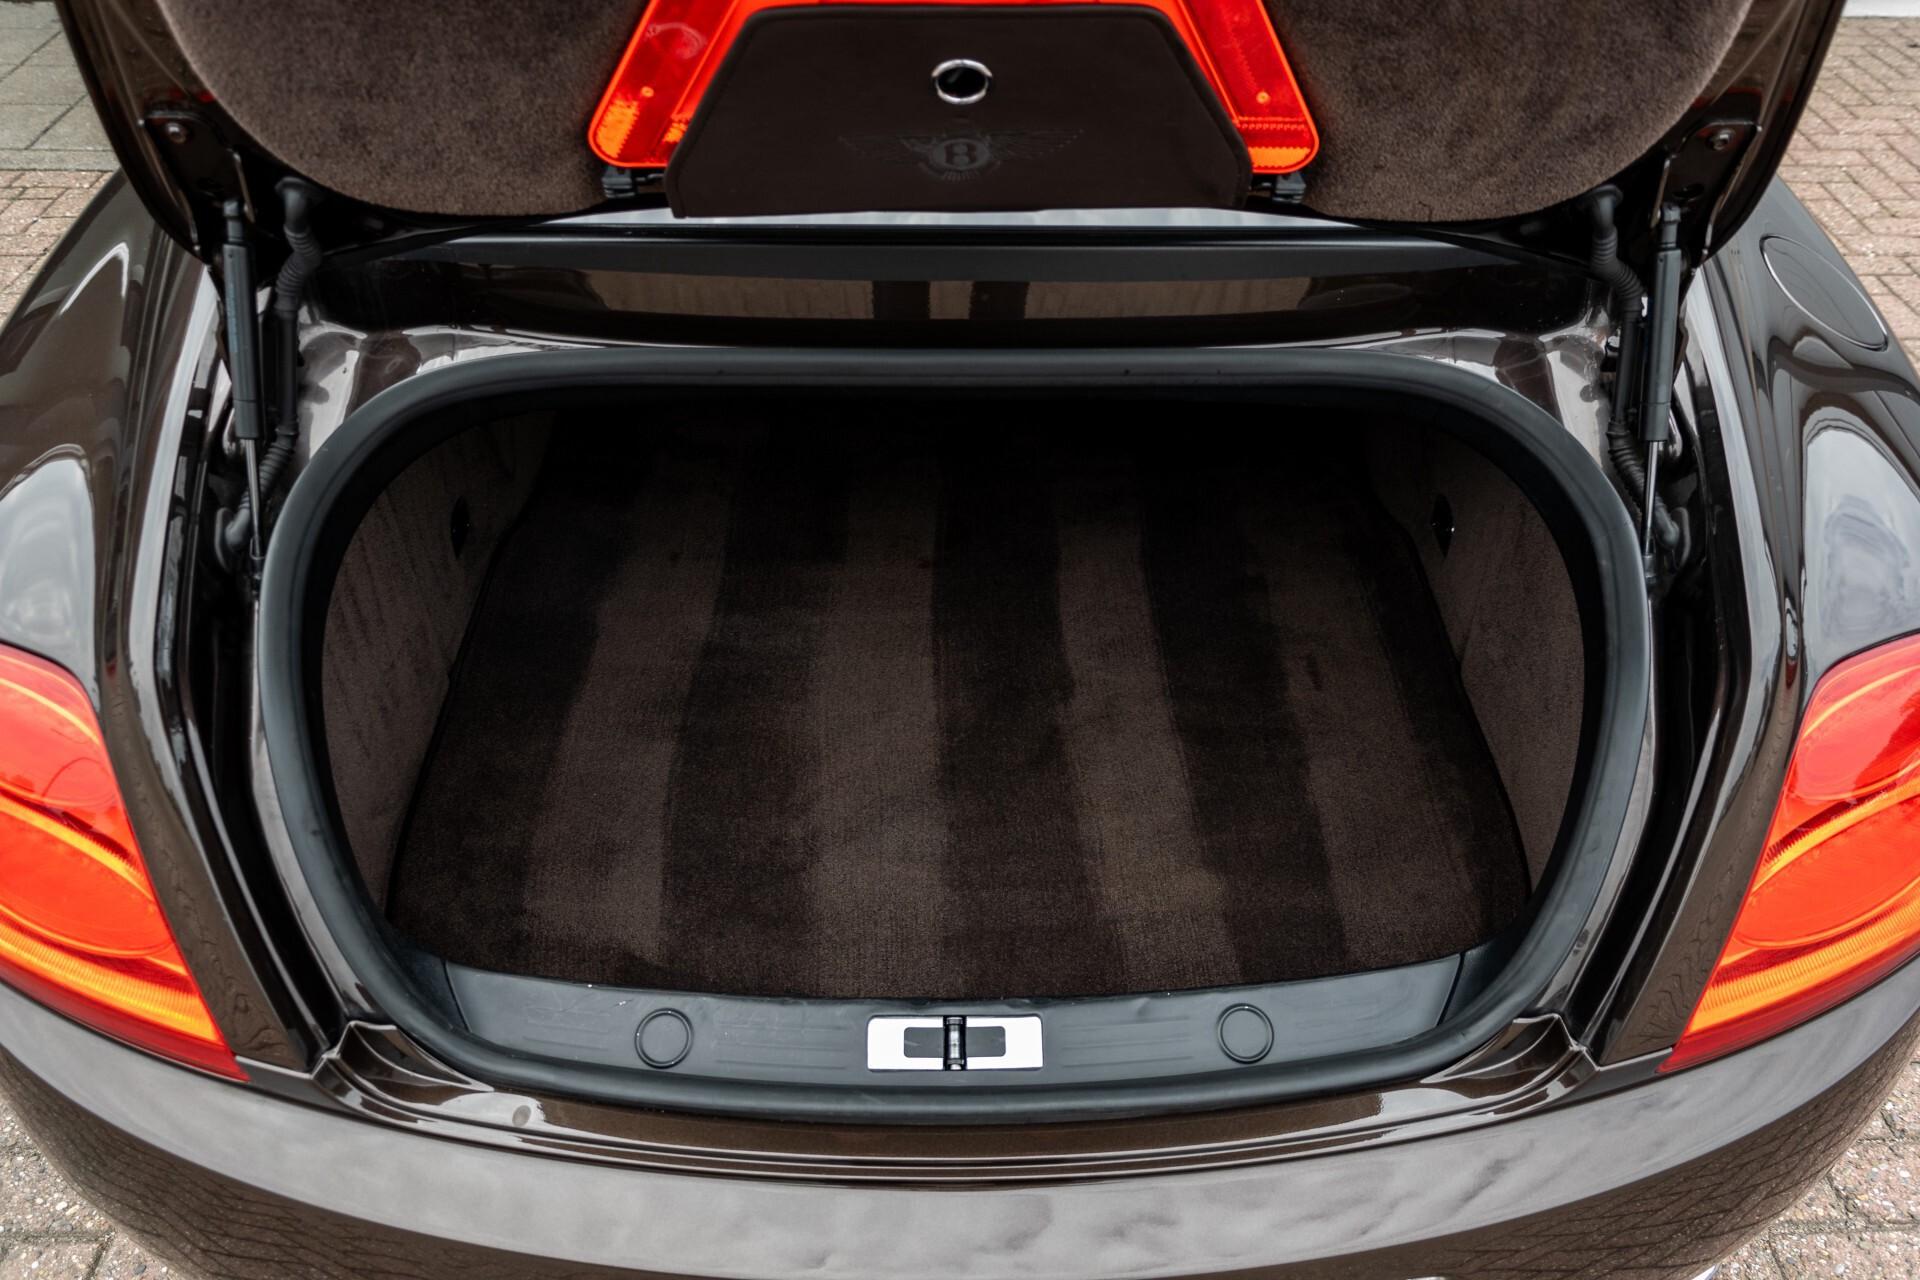 Bentley Continental GT 6.0 W12 GT Speed Ceramic Brakes/Mulliner/Standkachel/Keyless Aut6 Foto 53